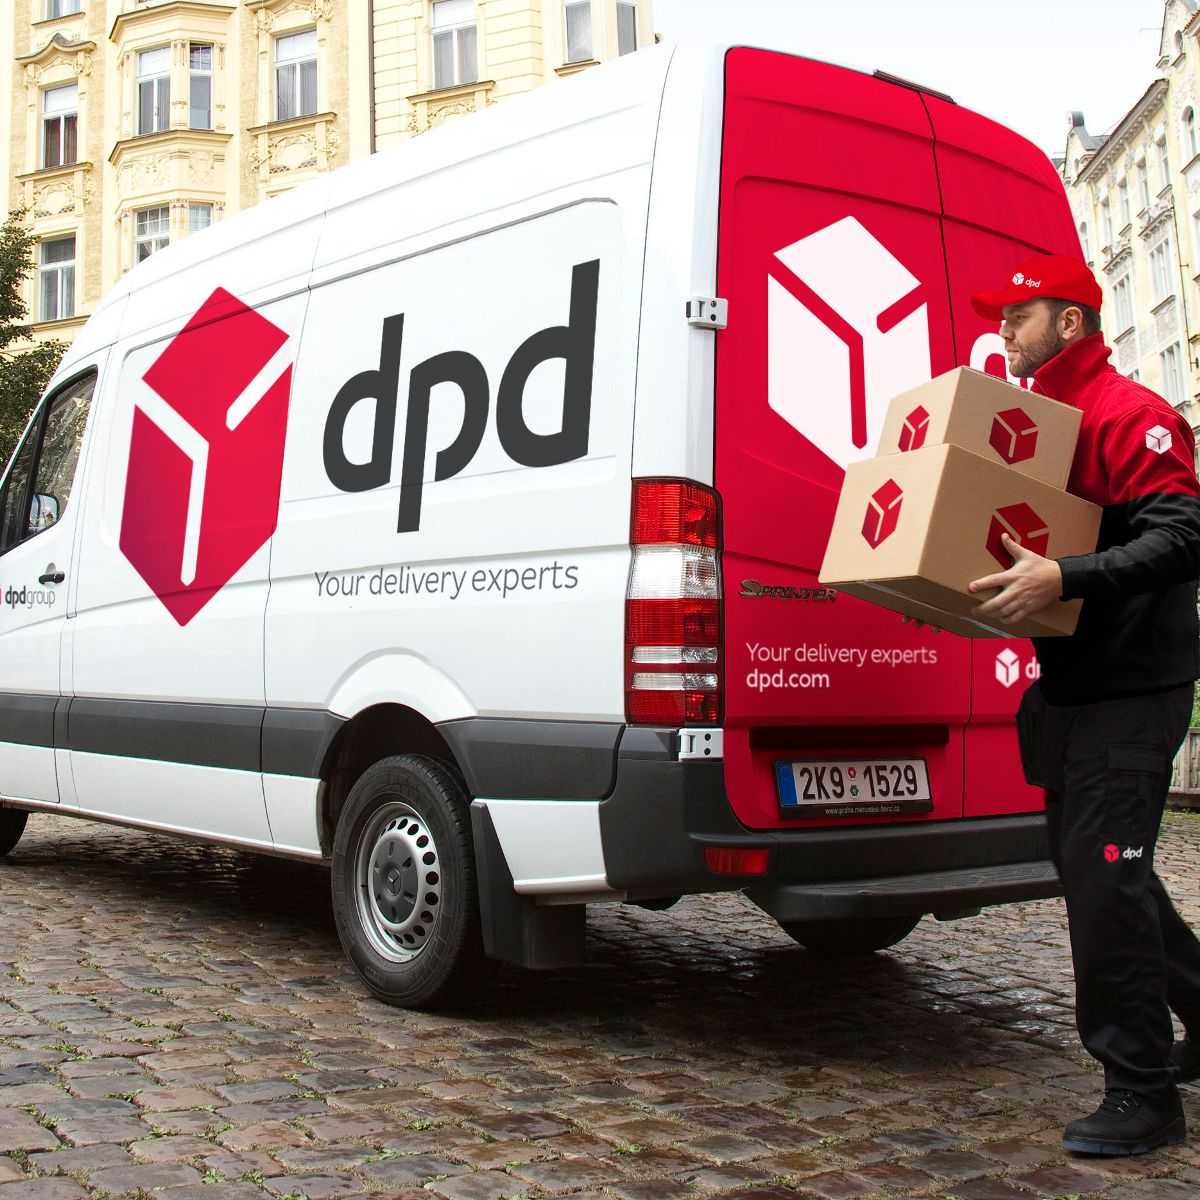 DPD image 3